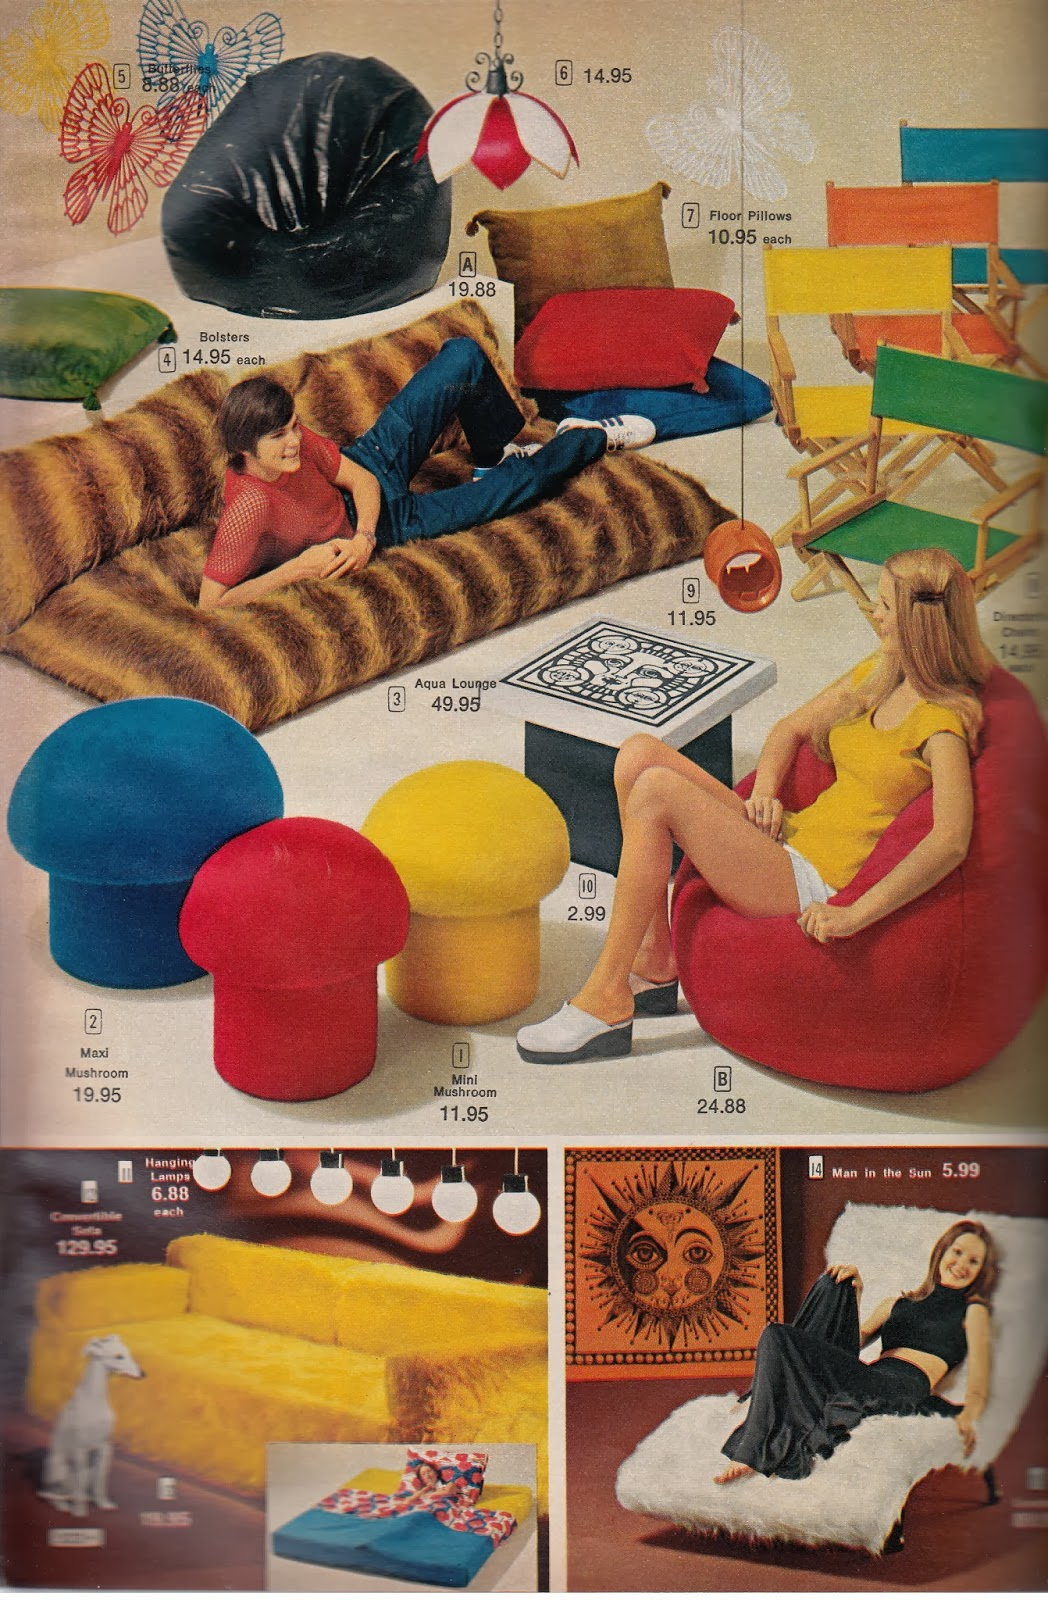 Mushroom Bean Bag Chair Mega Motion Lift Kathy Loghry Blogspot Crazy Catalog Stuff Part 2 Pimp